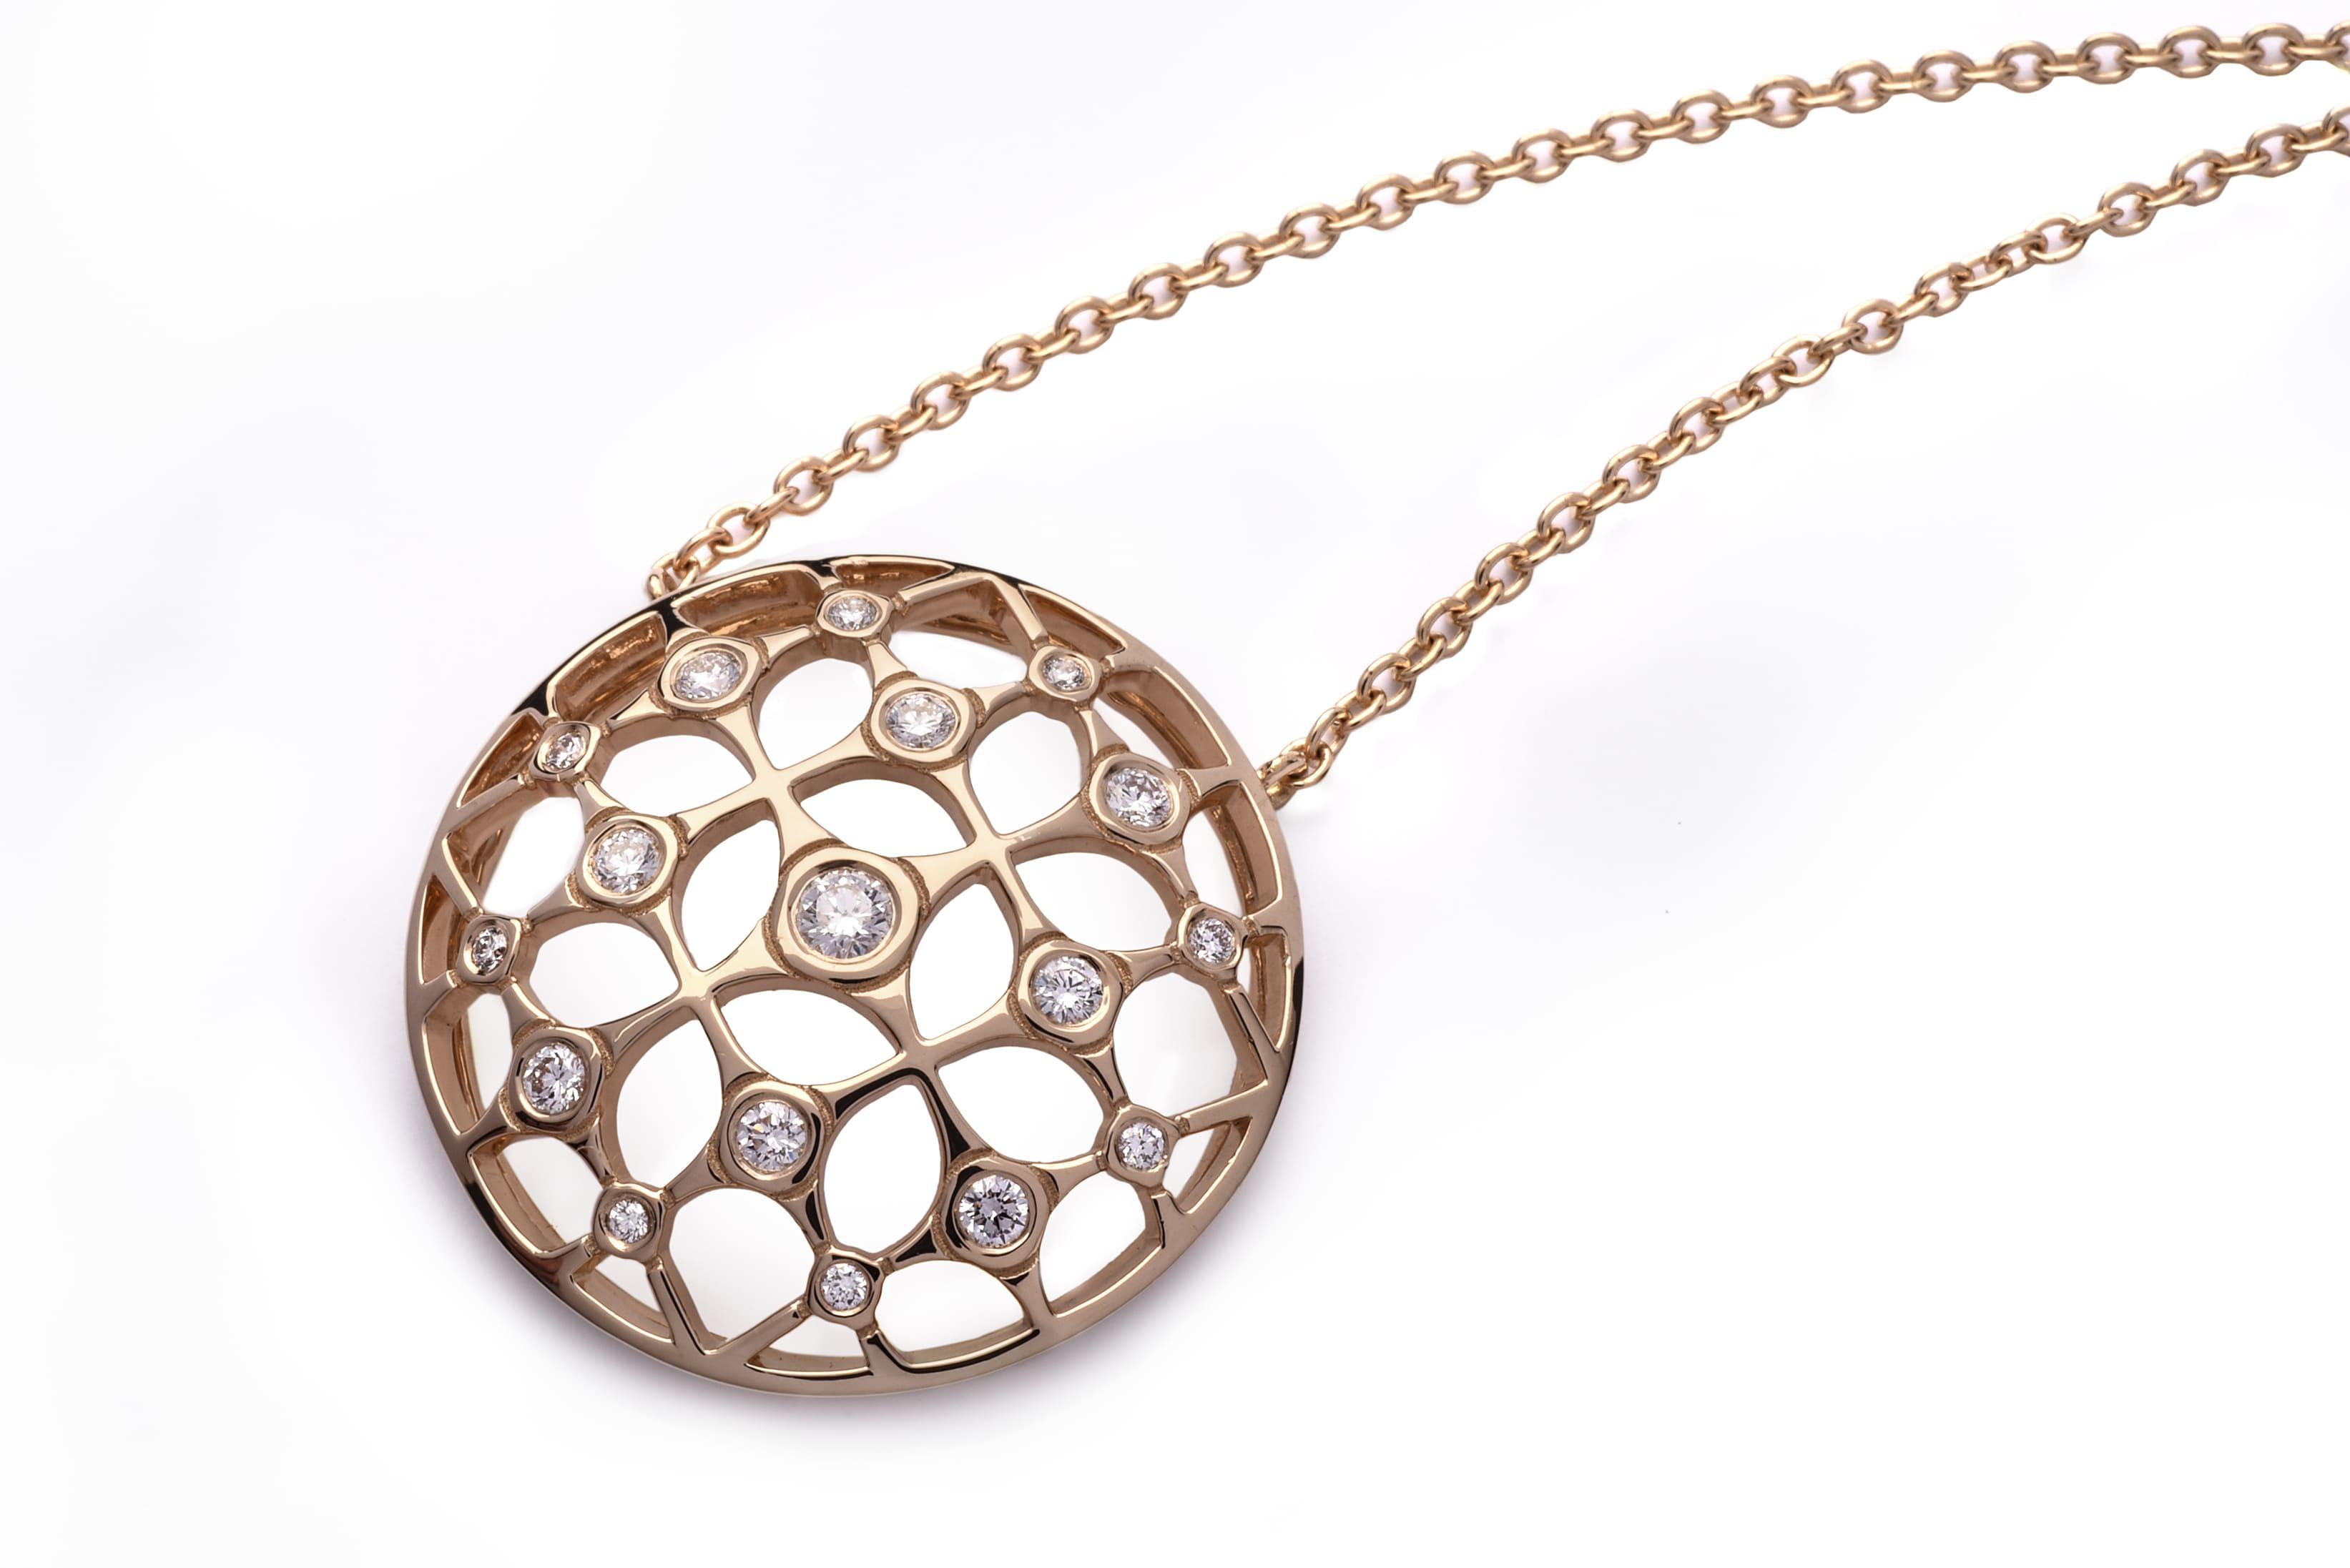 colgantes de oro y diamantes_ramon jewellers (6)